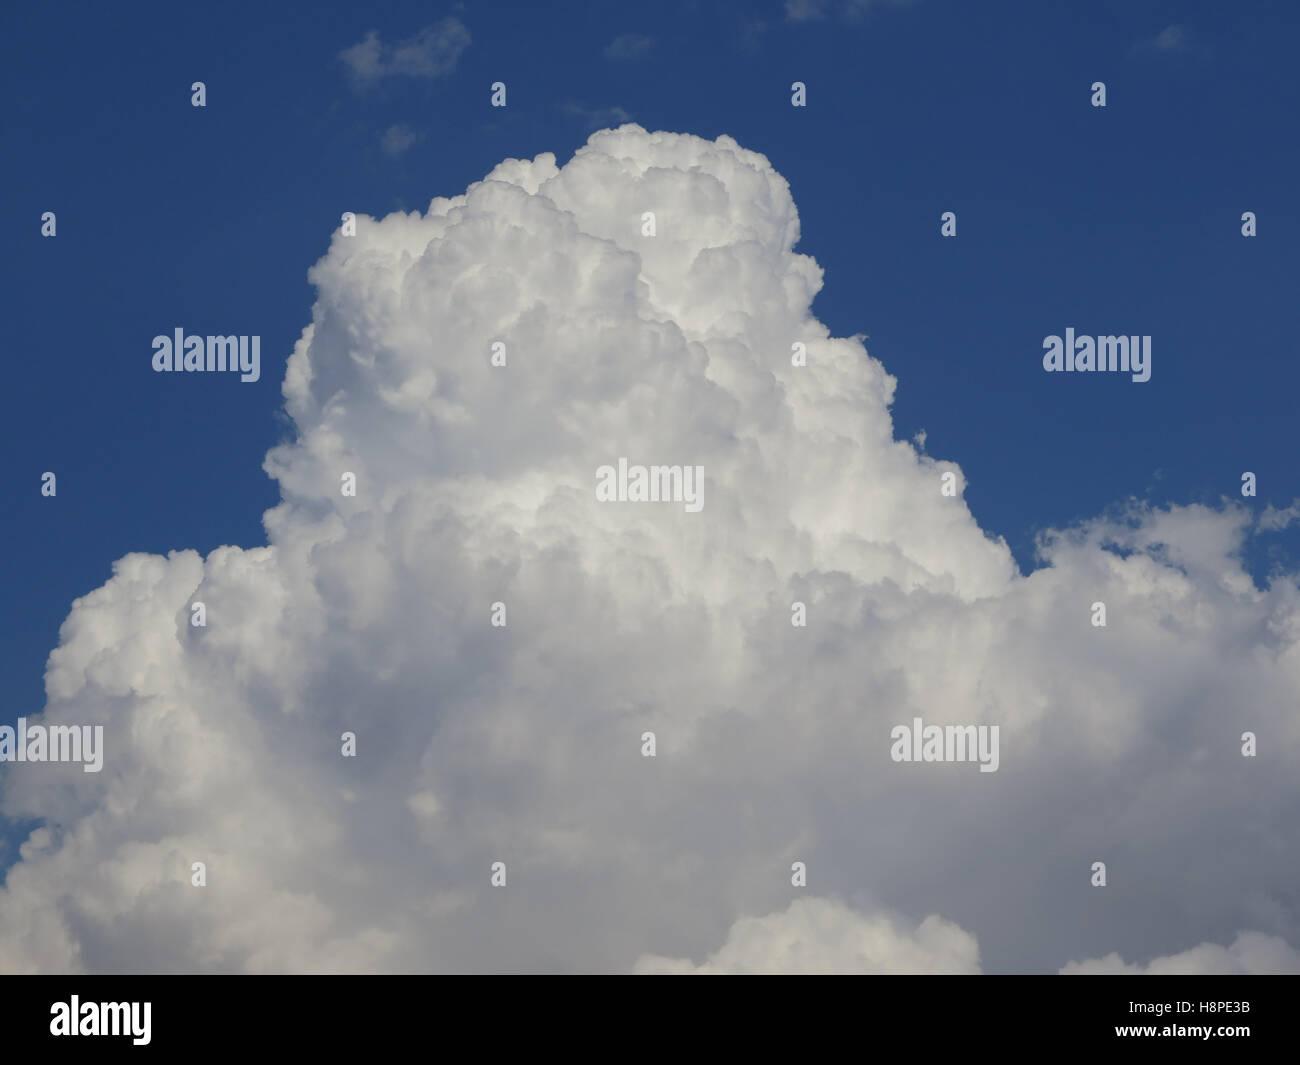 cumulonimbus clouds over Guadalhorce Valley Andalusia Spain - Stock Image